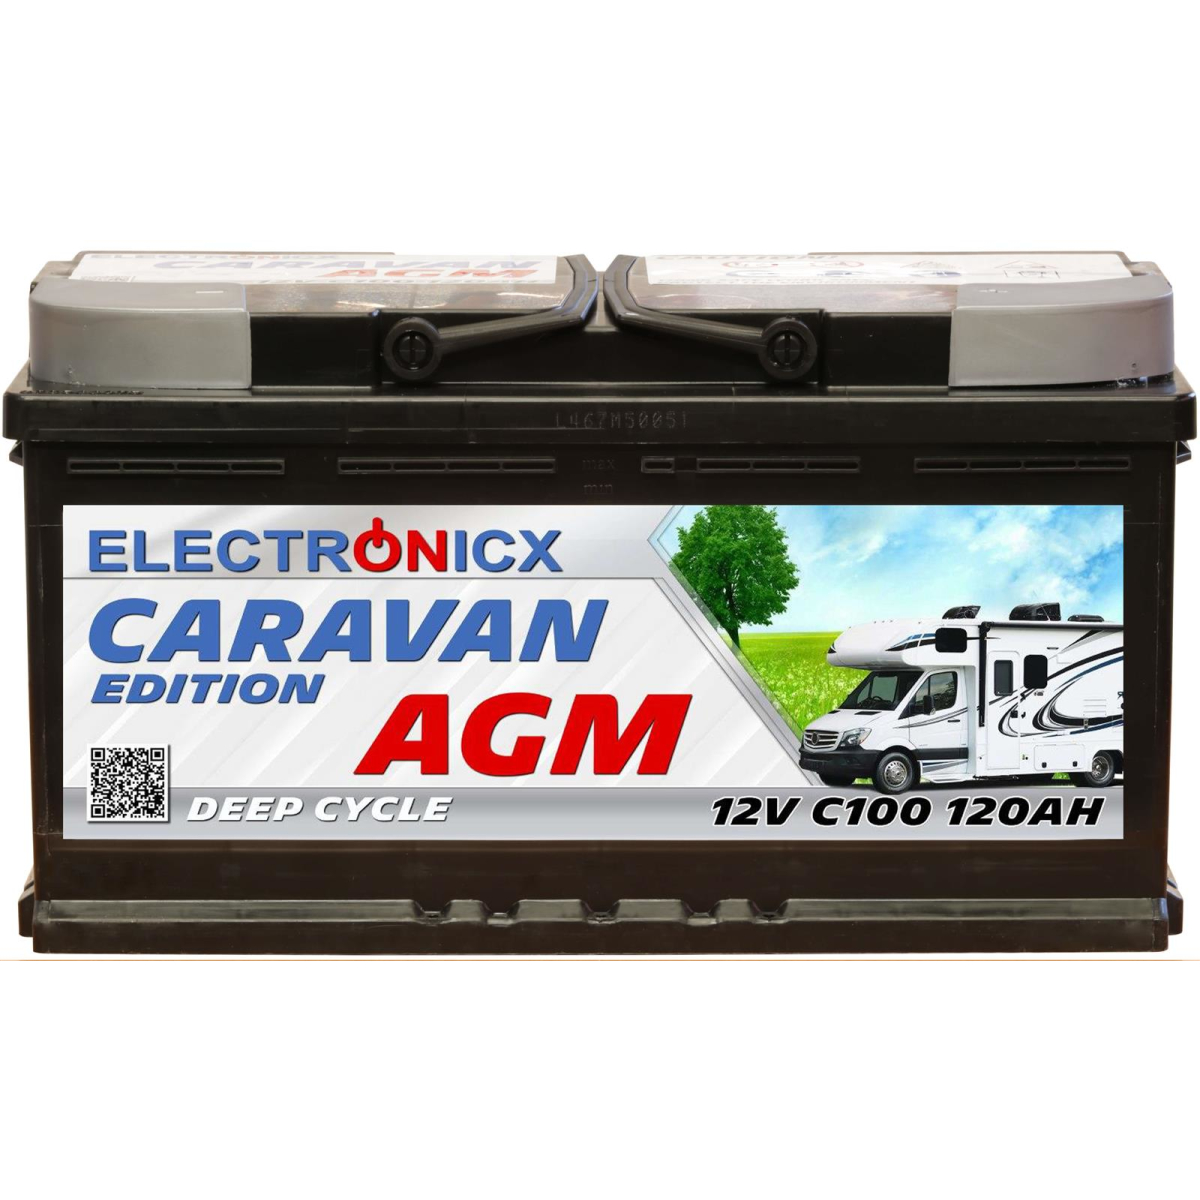 Electronicx Caravan Edition V2 Batterie AGM 120 AH 12V Wohnmobil Boot Versorgung